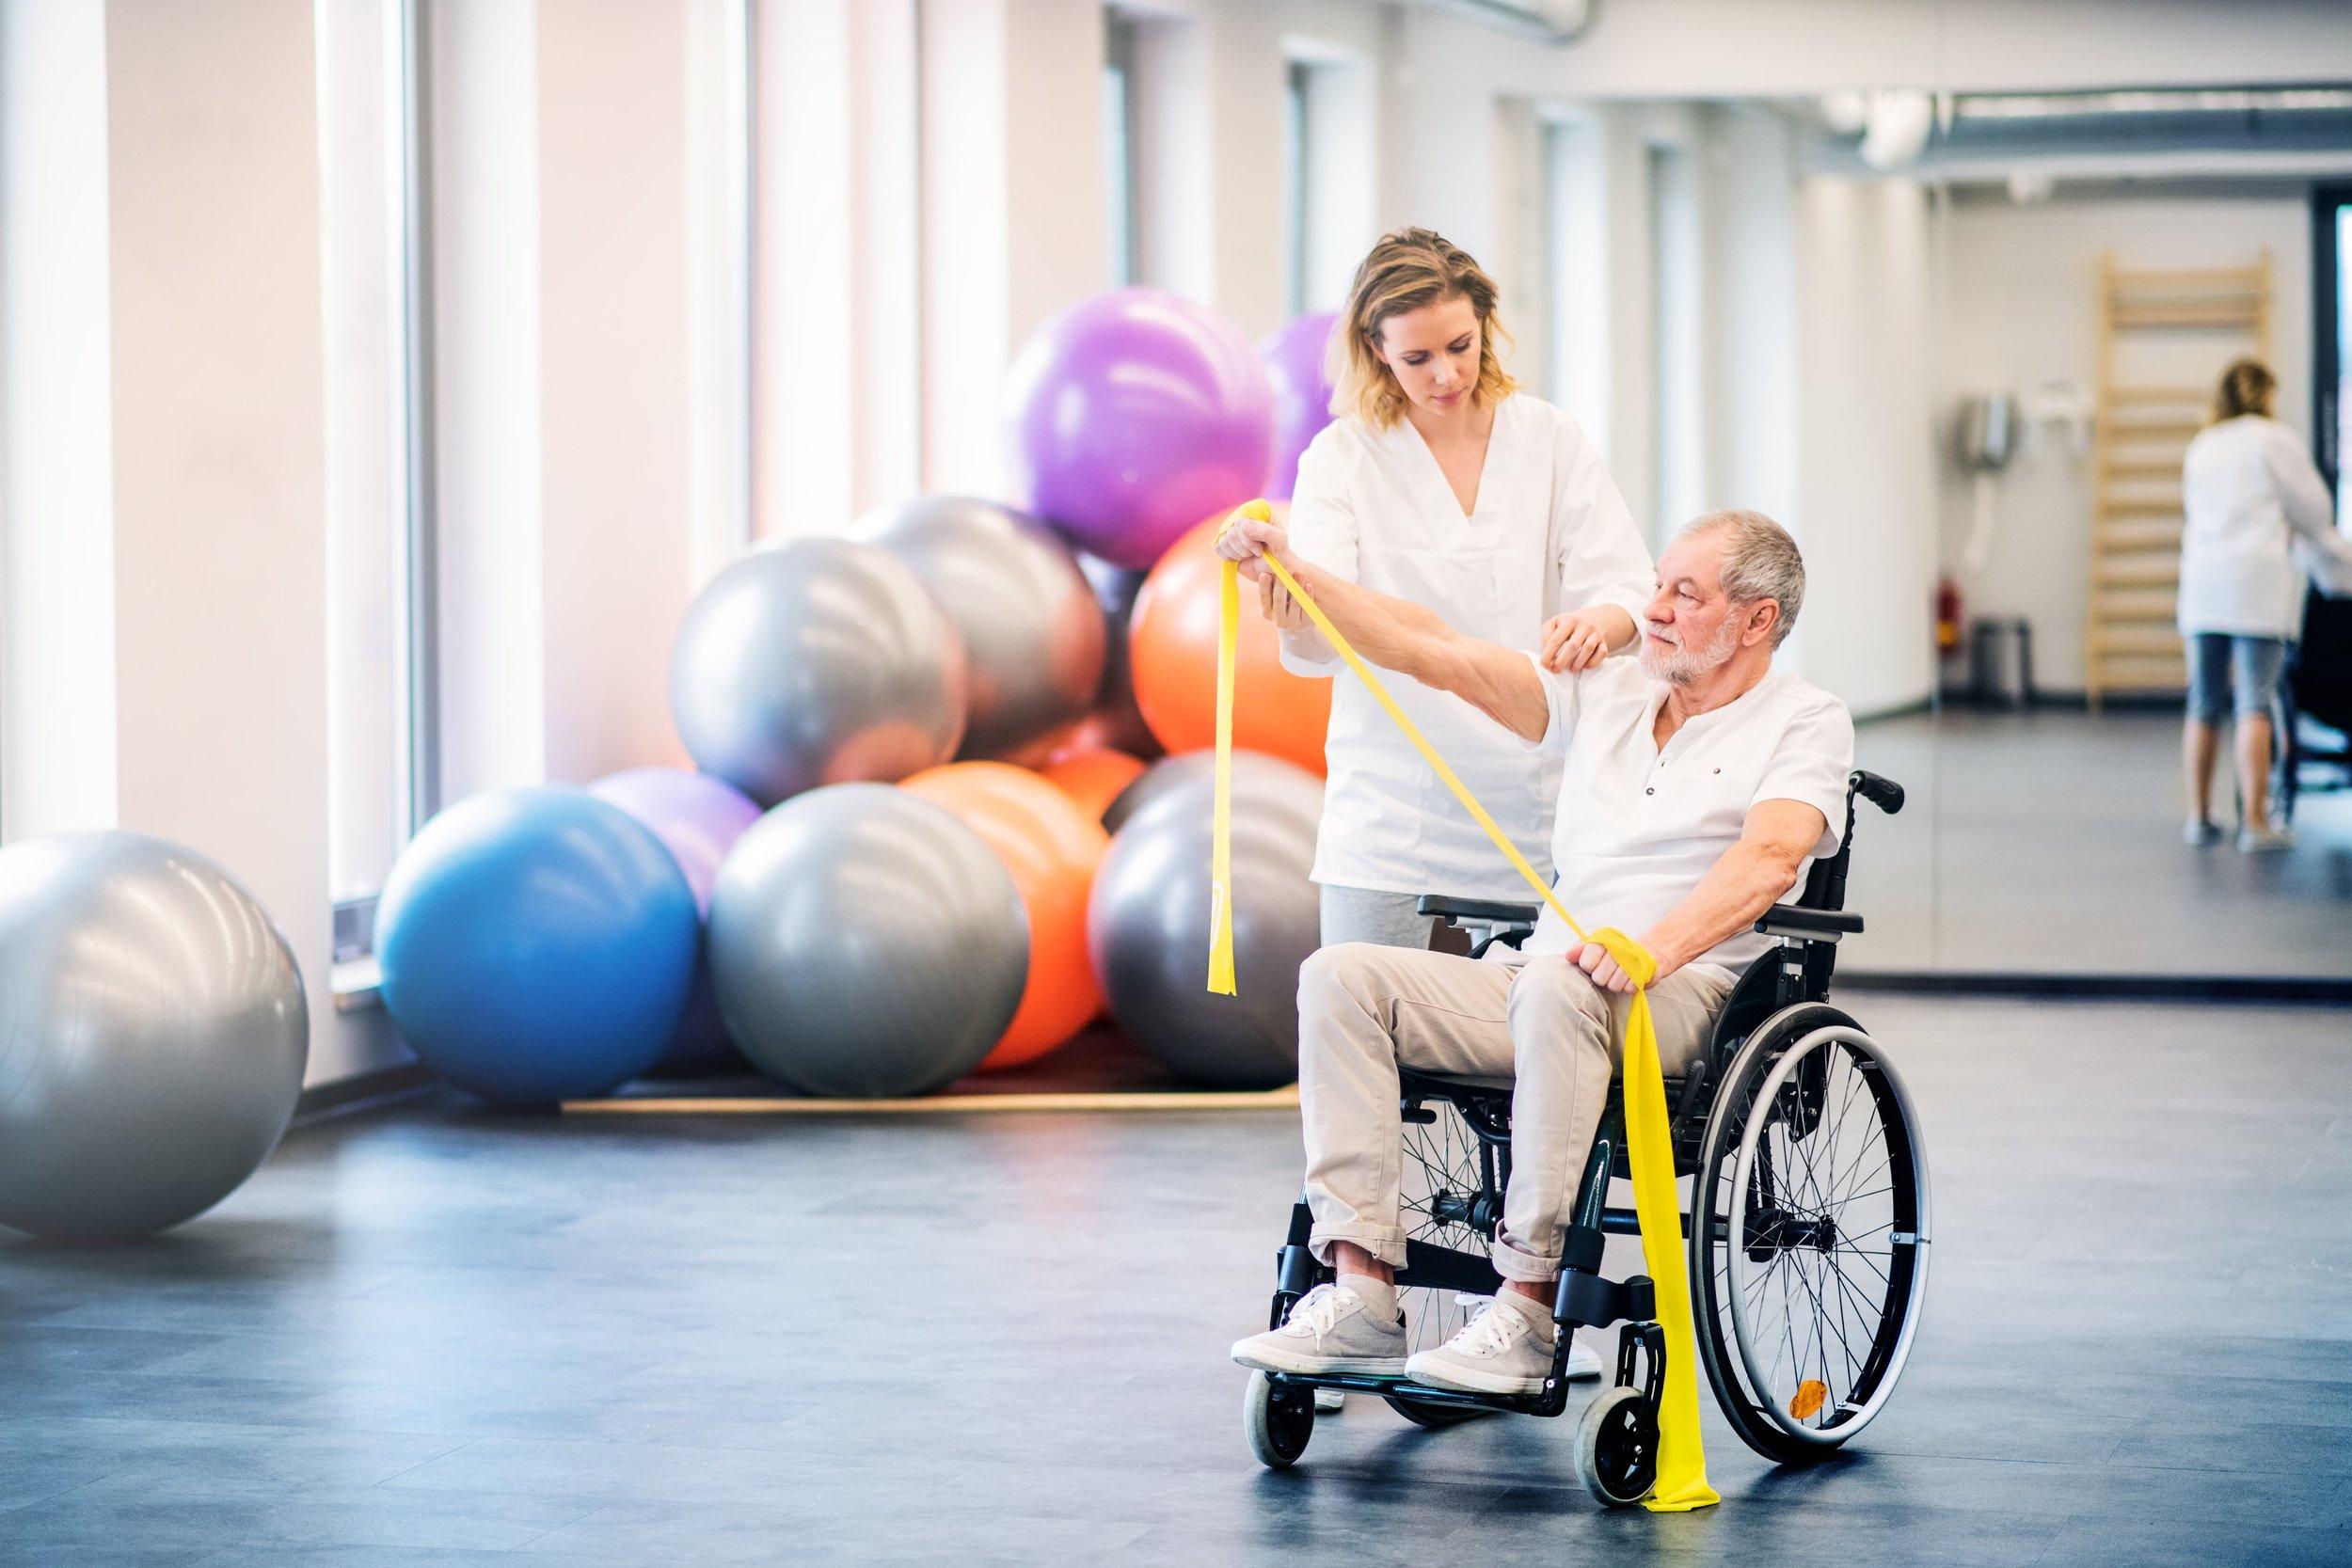 nurse-doing-therapy-exercises-with-senior